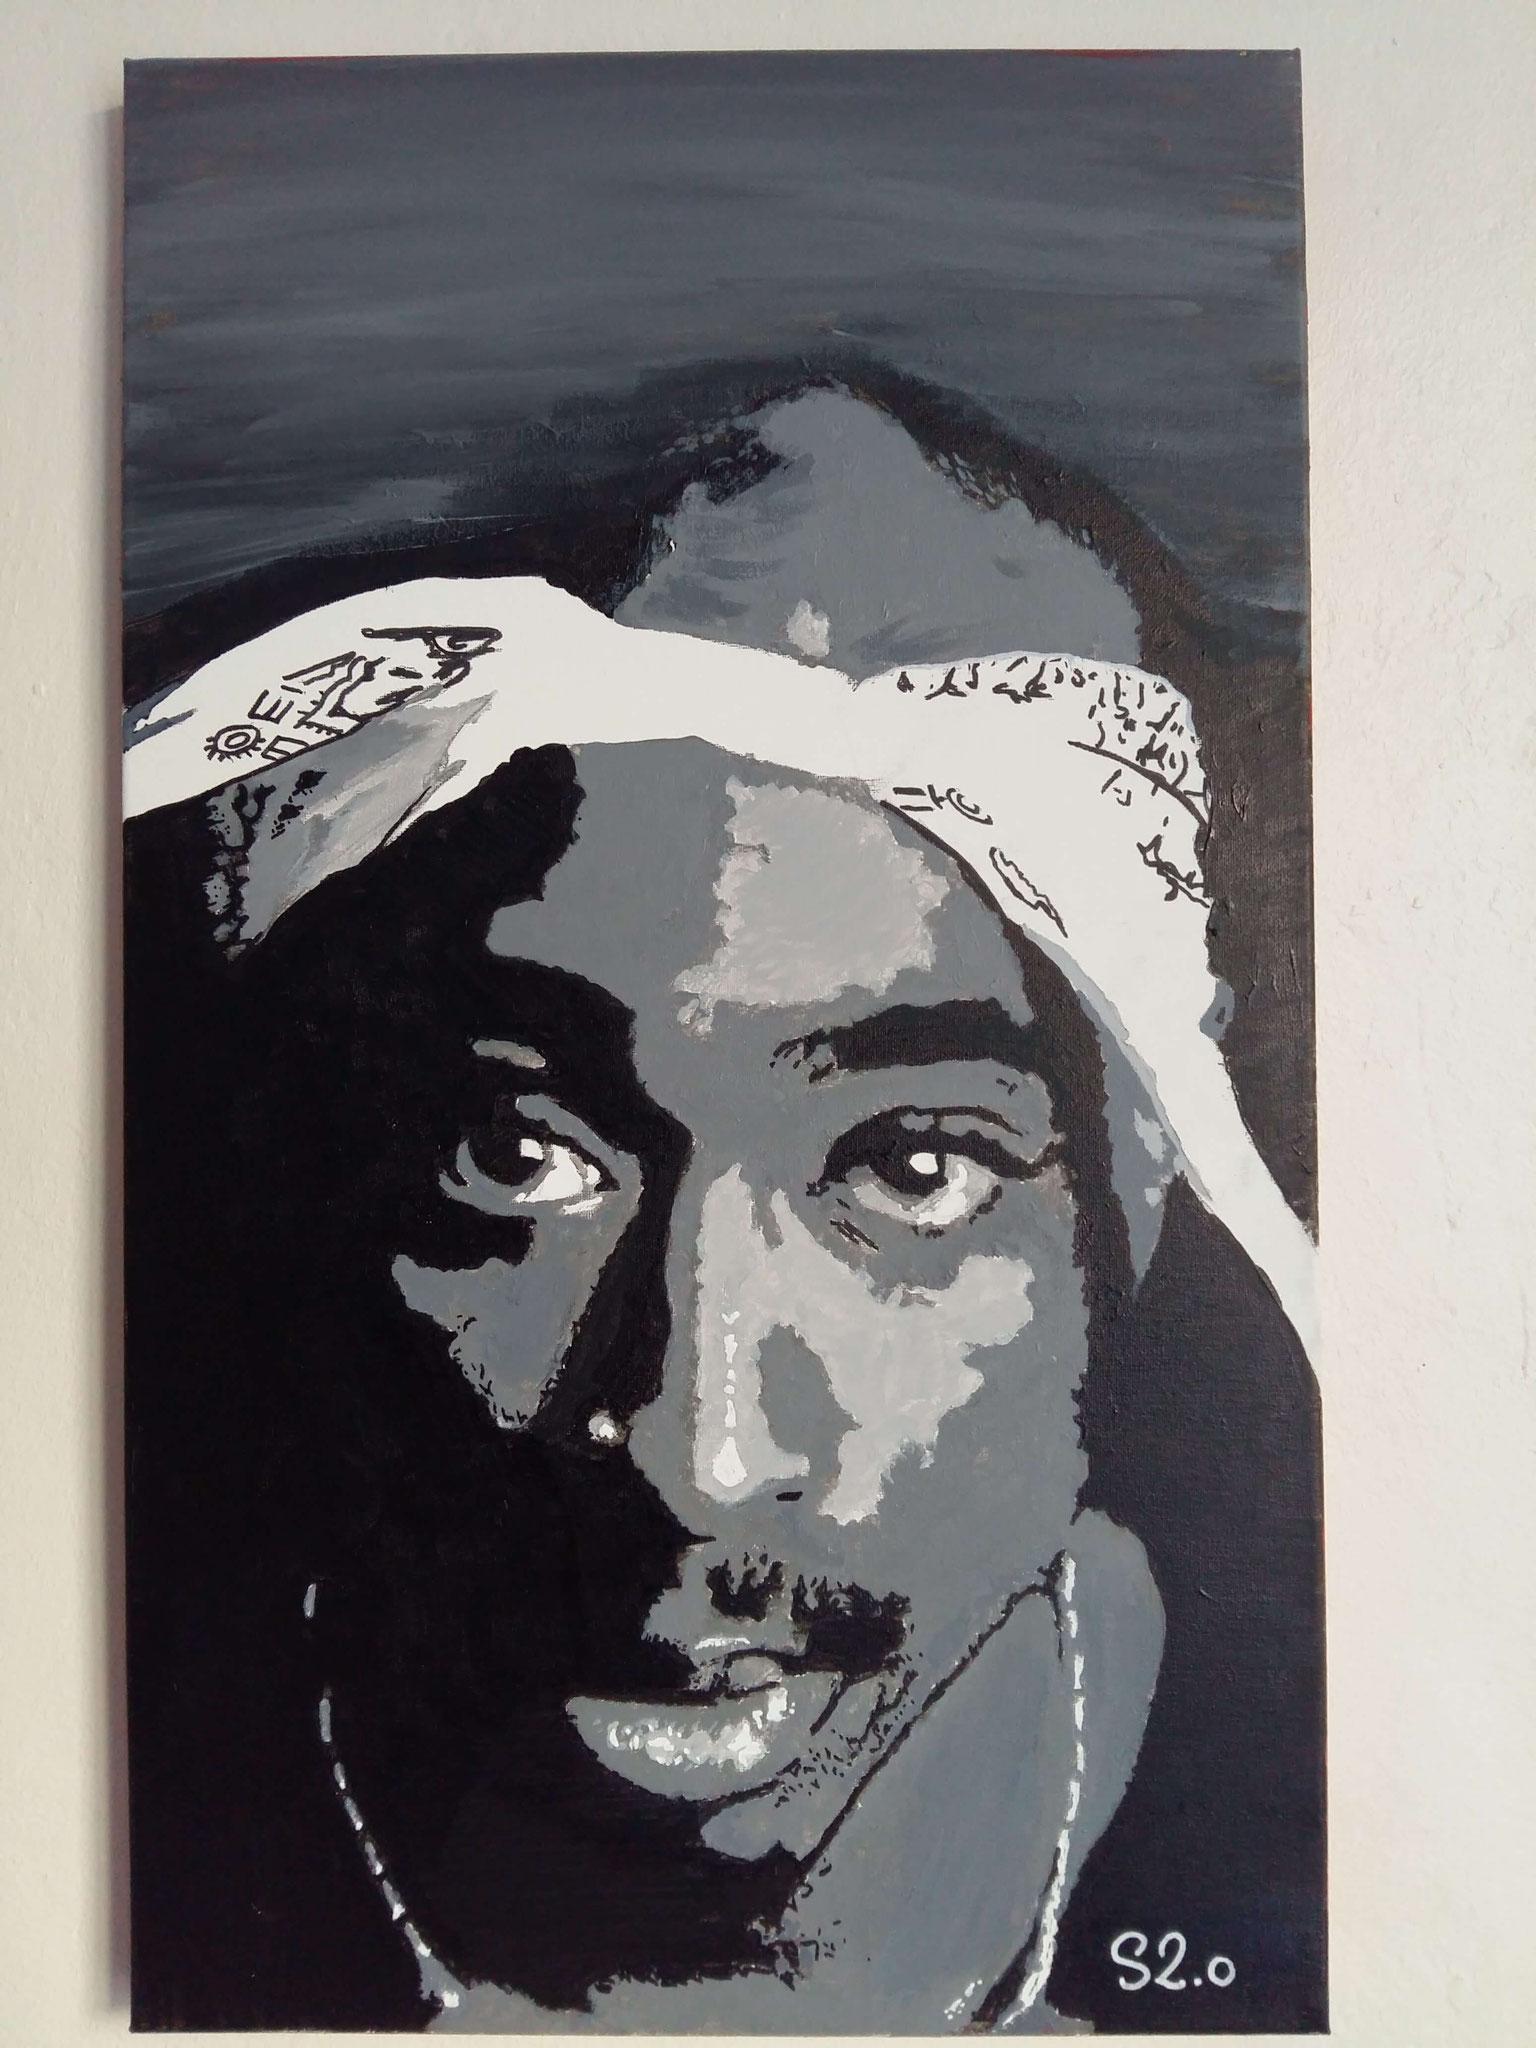 Tupac Shakur Street art sur toile par Slave 2.0